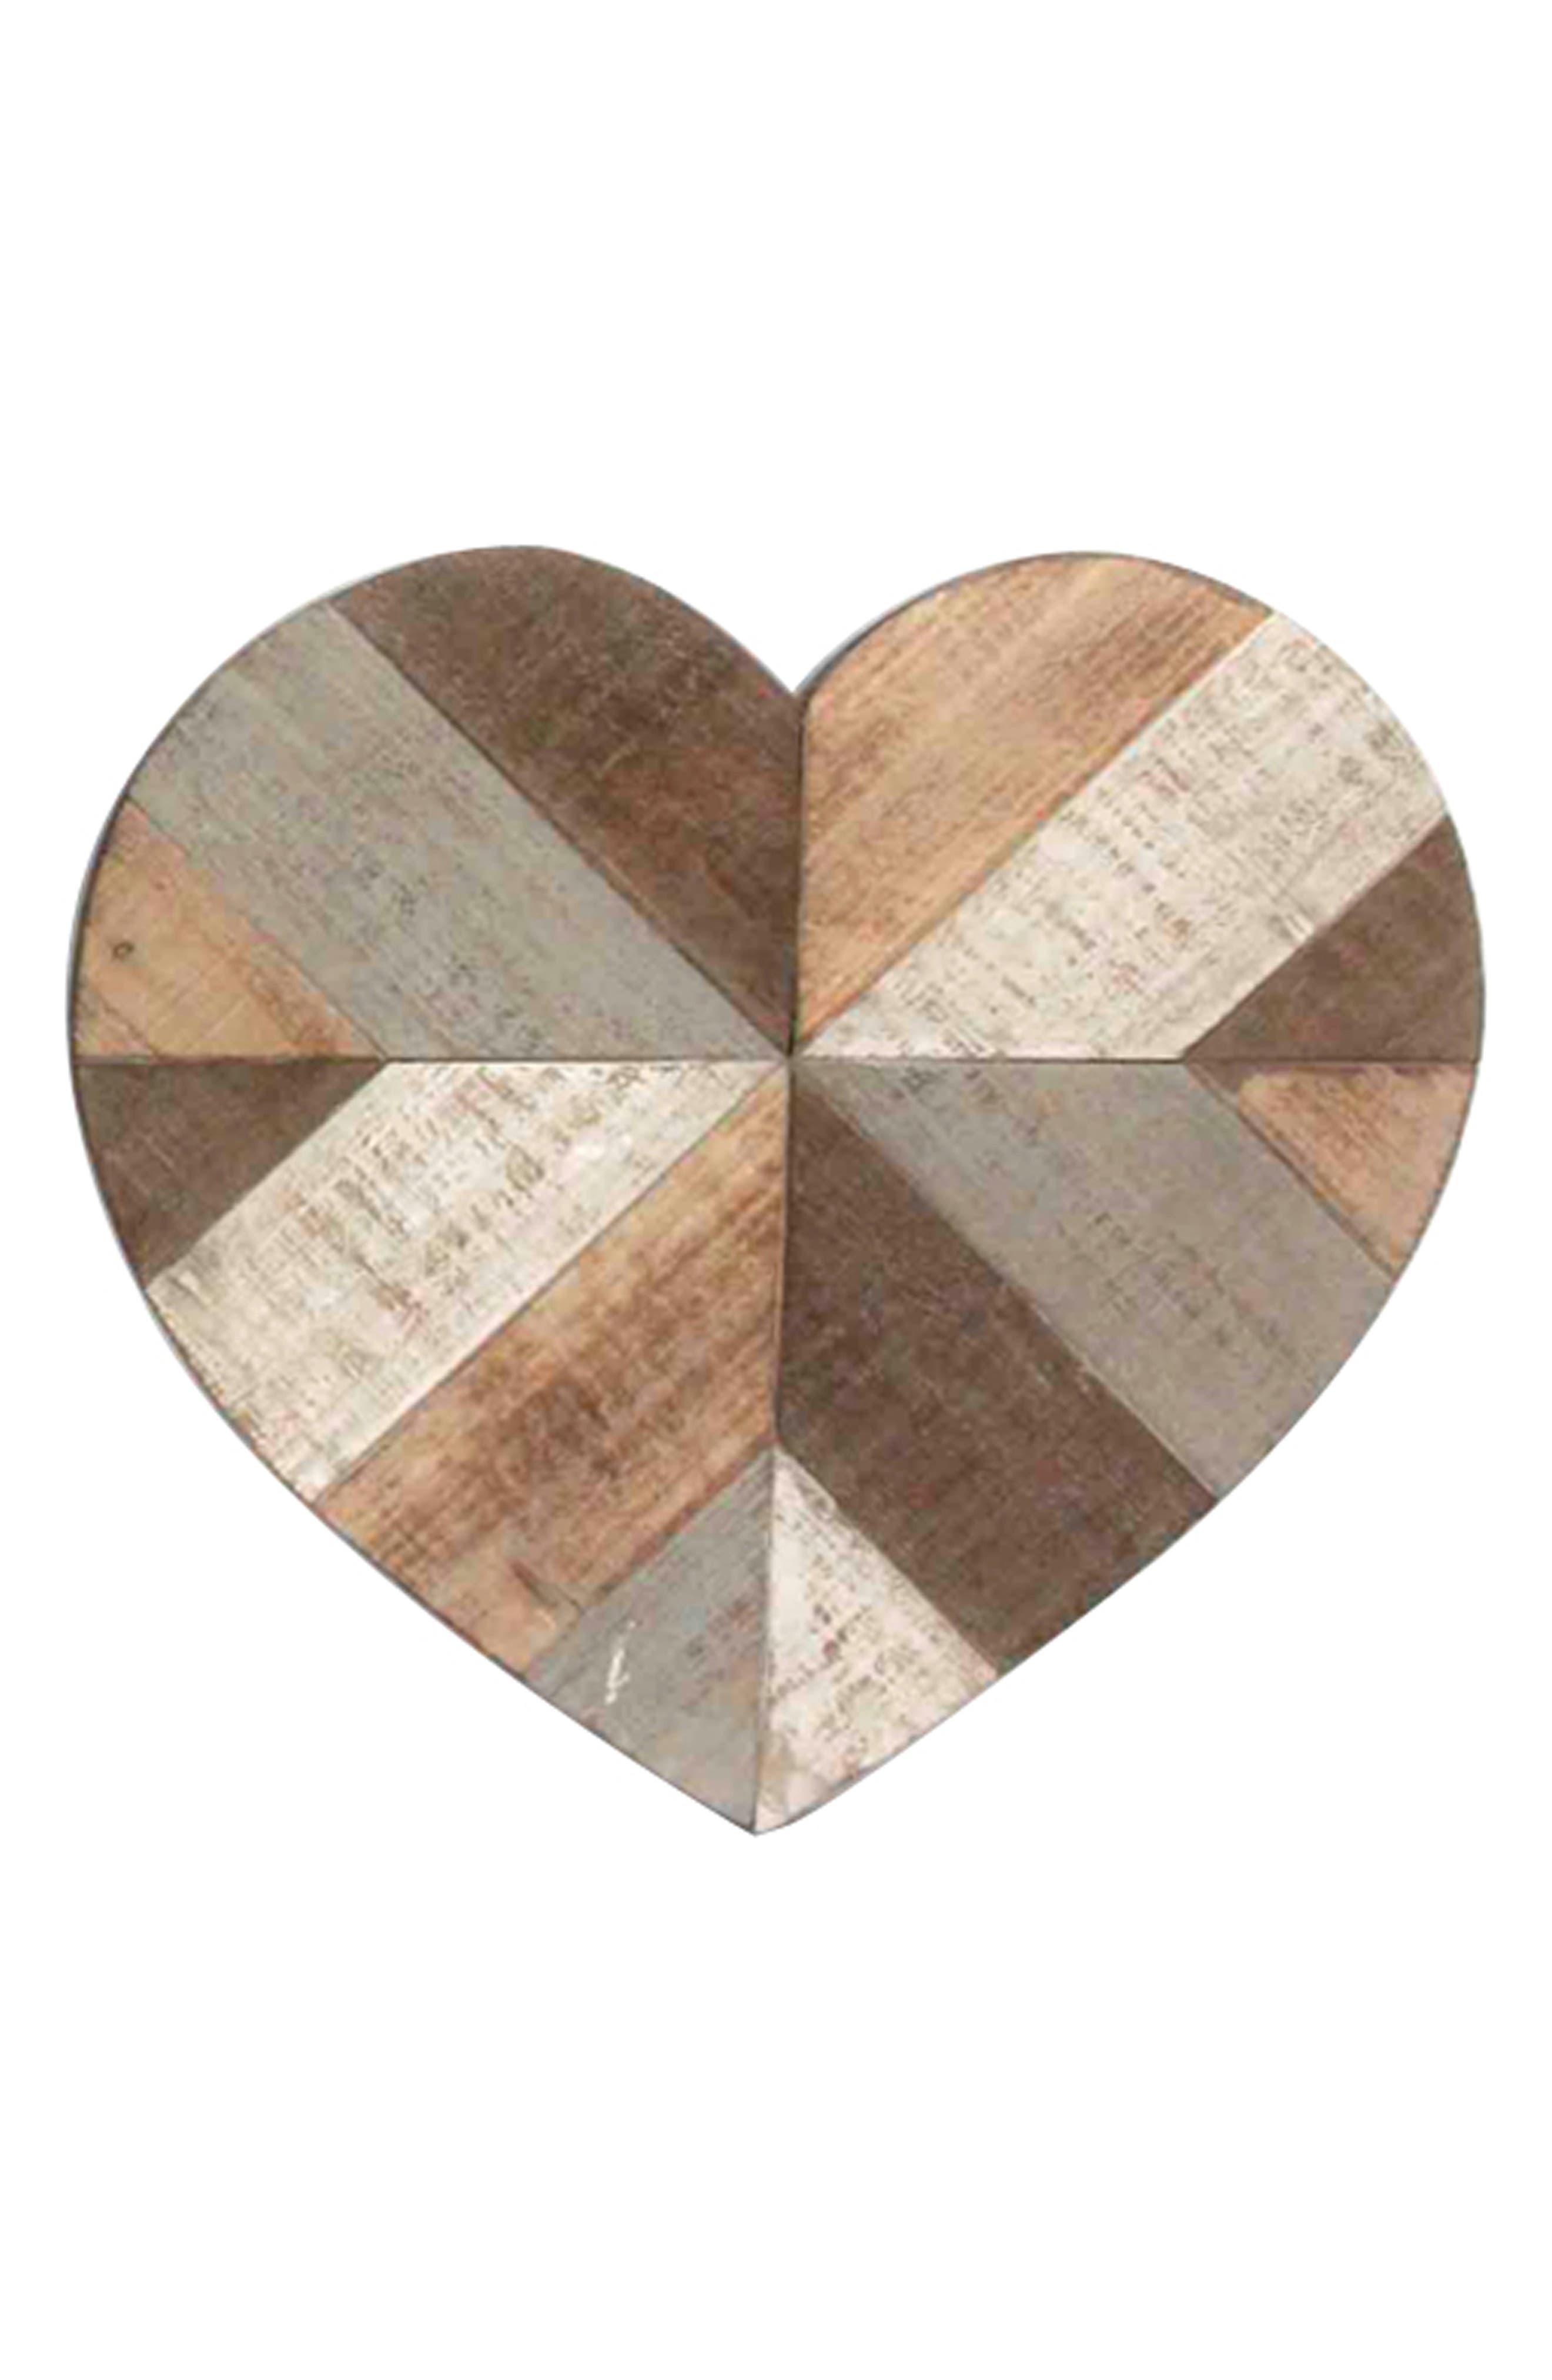 Main Image - Crystal Art Gallery Wooden Heart Wall Art